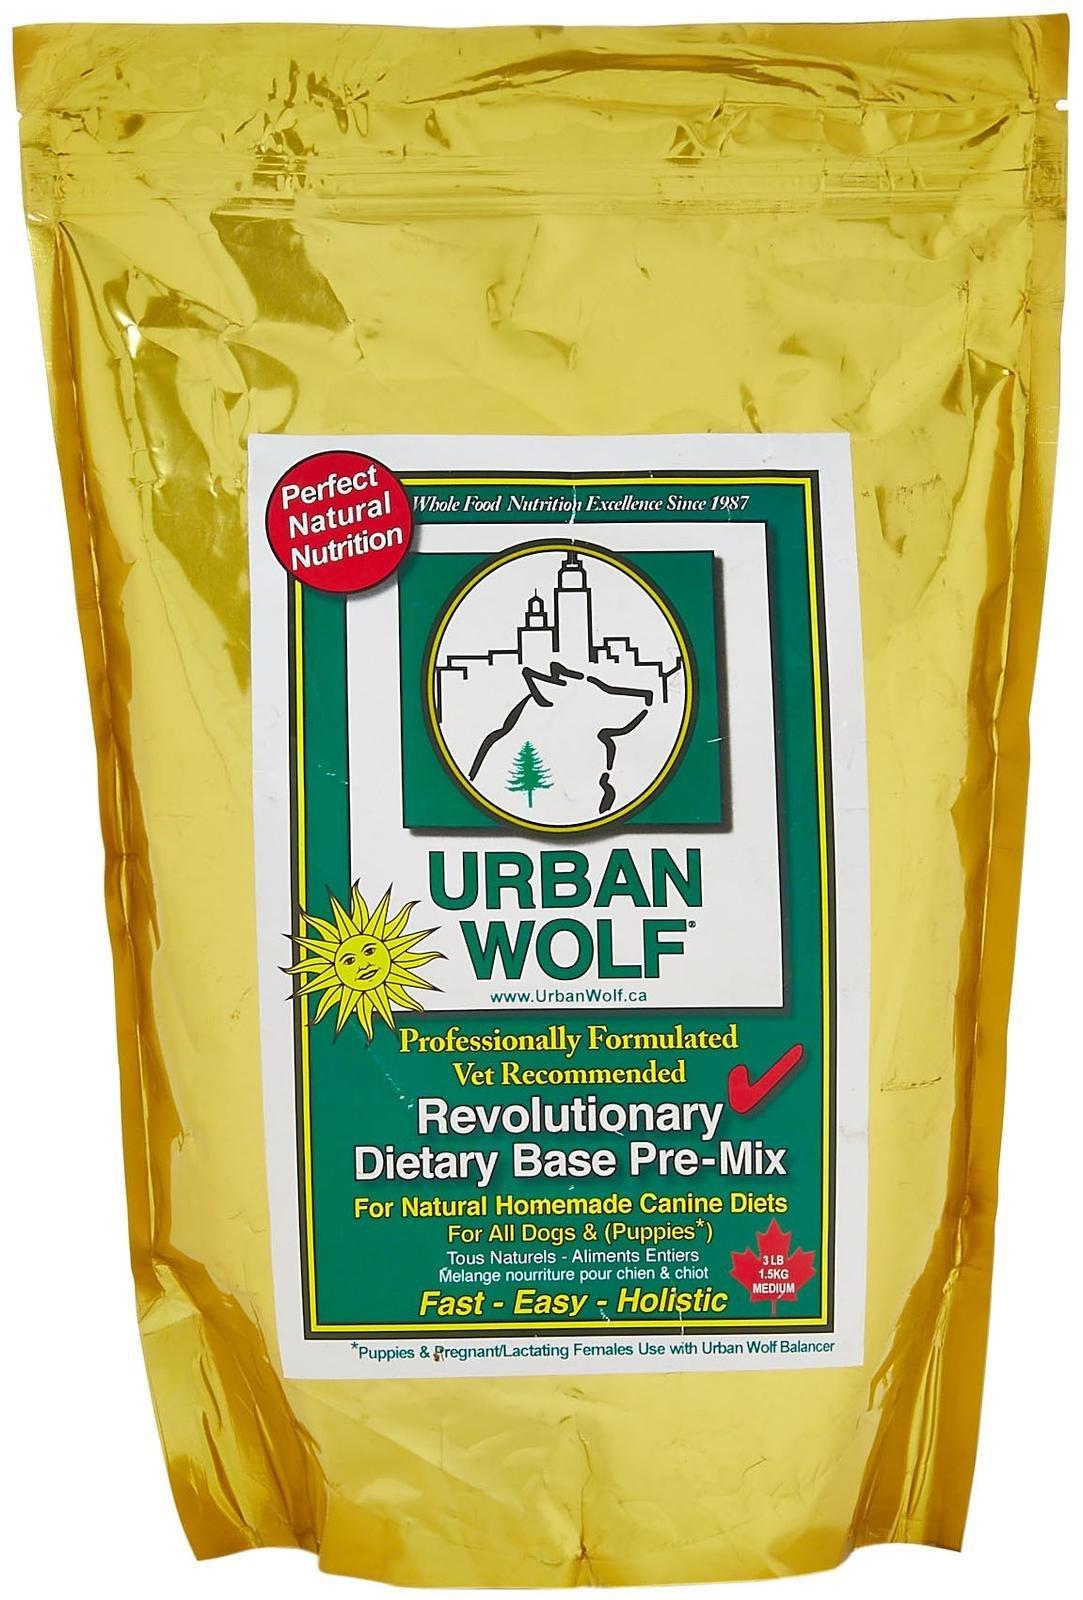 Urban Wolf Dog Food Mix - Dietary Base Mix - 3 Lb